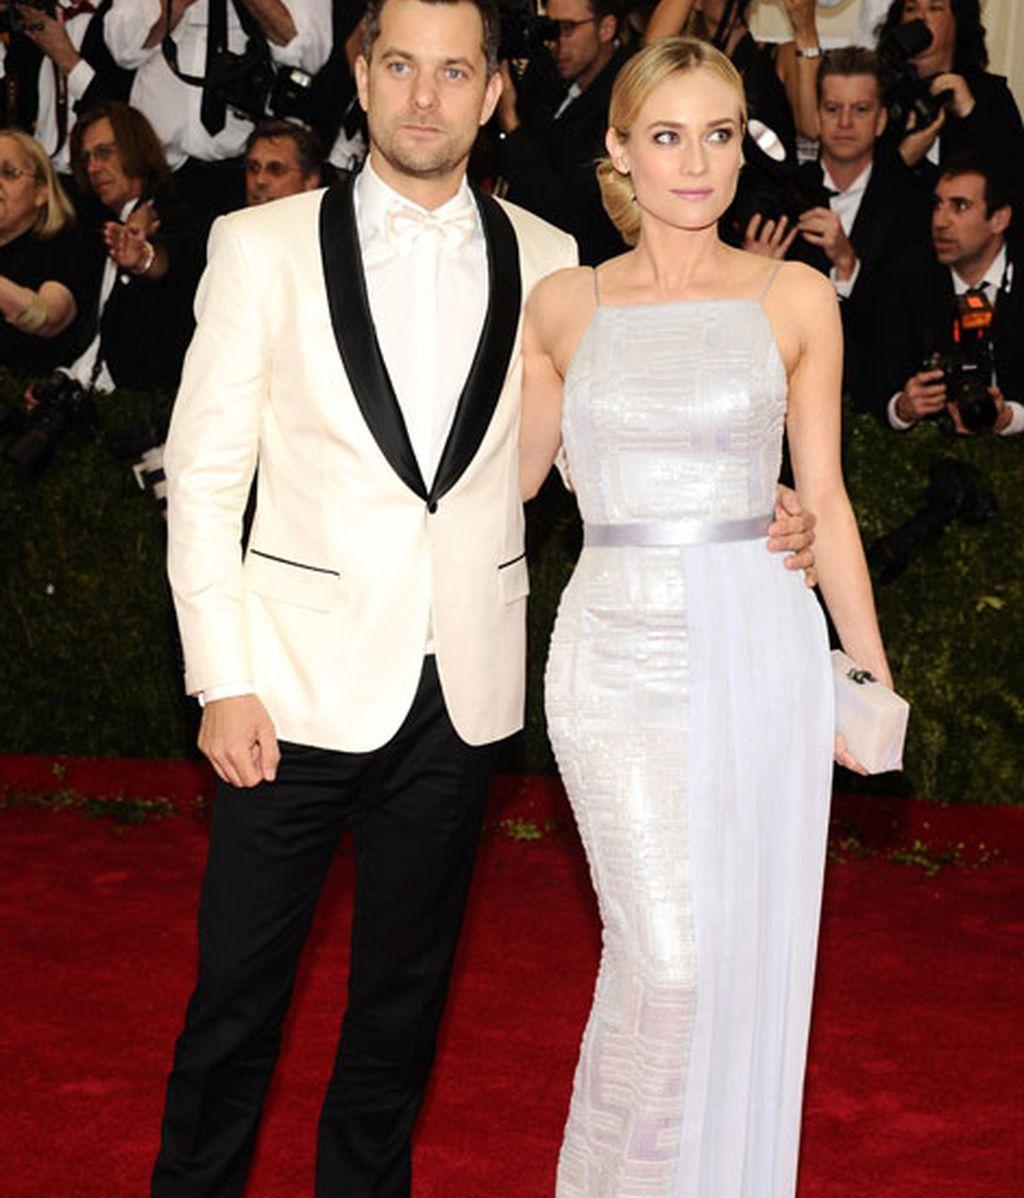 La pareja formada por Joshua Jackson y Diane Kruger